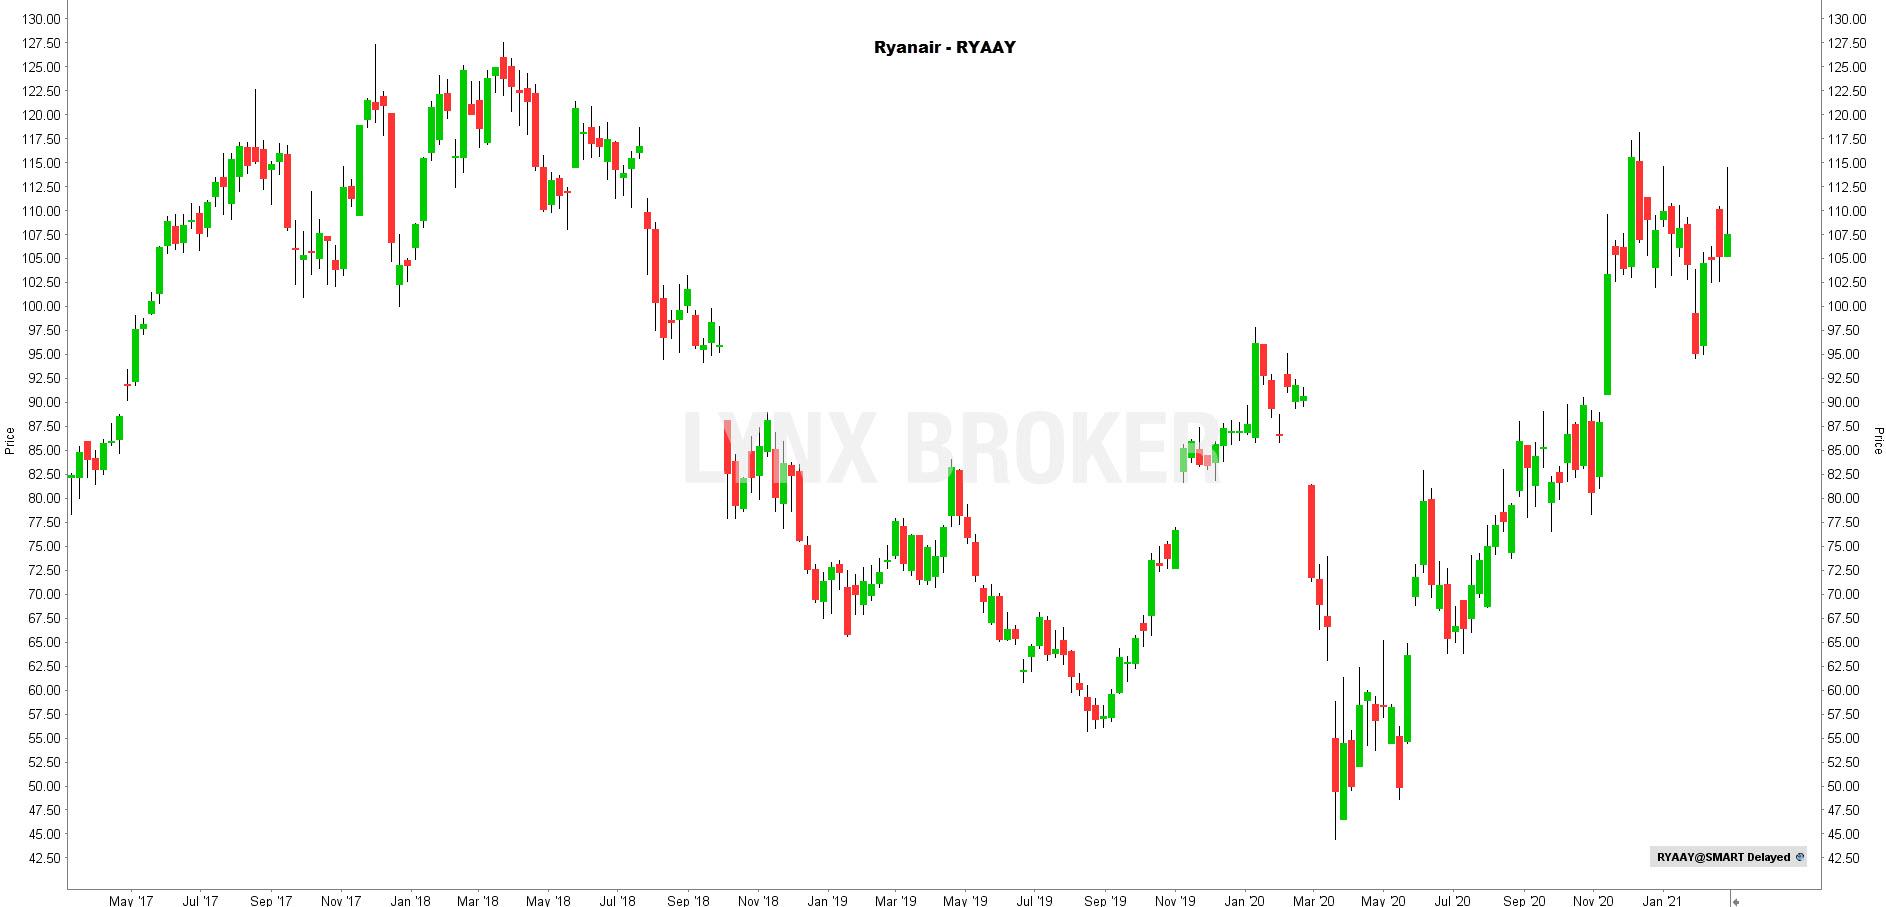 la chronique lynx broker 010321 - graphique Ryanair